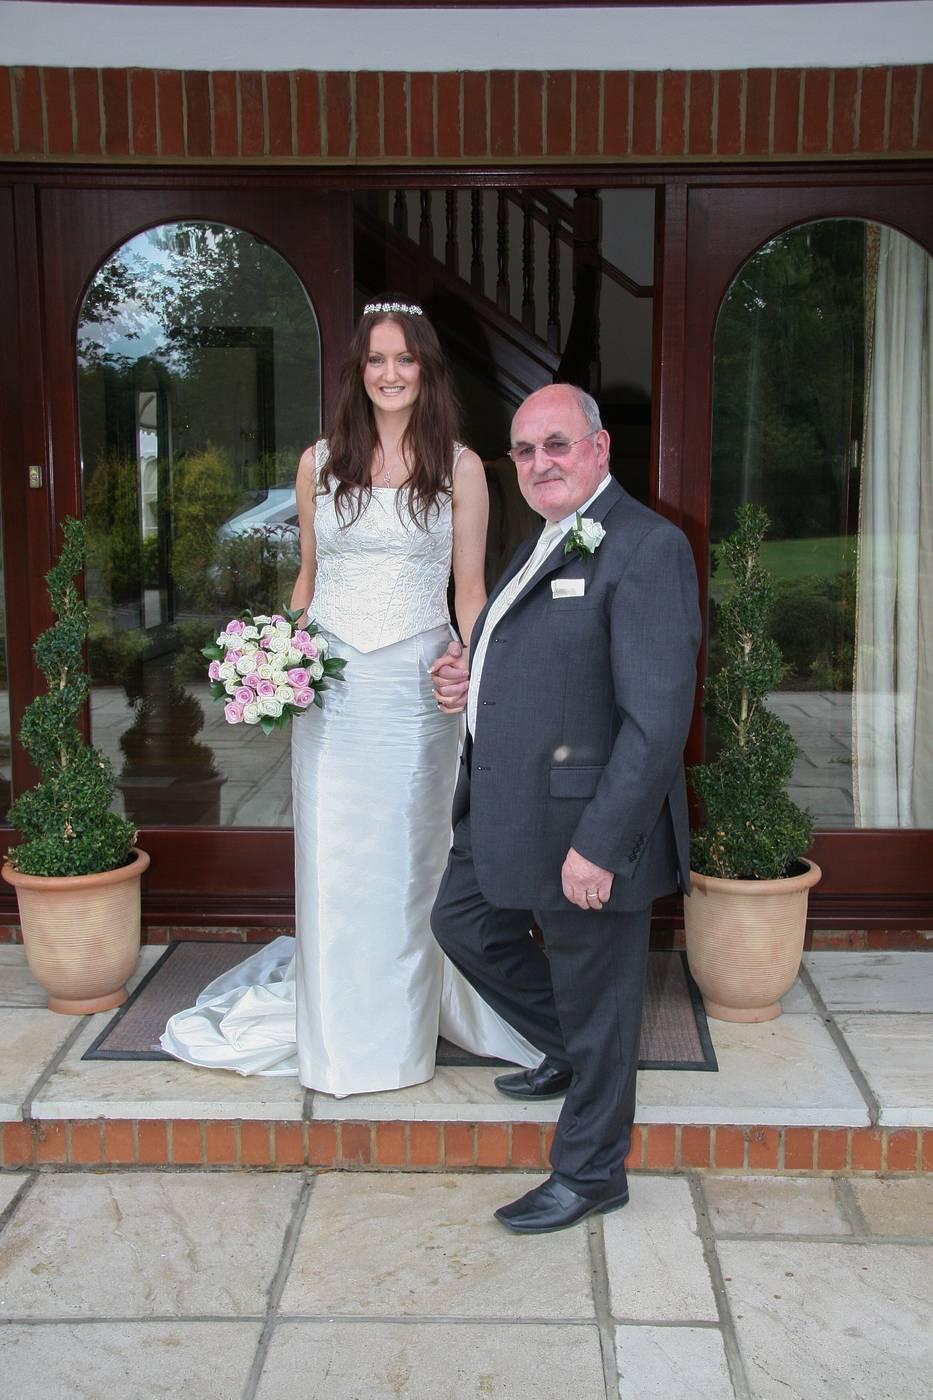 church-wedding-english-london-photographer-photography-fun-0003